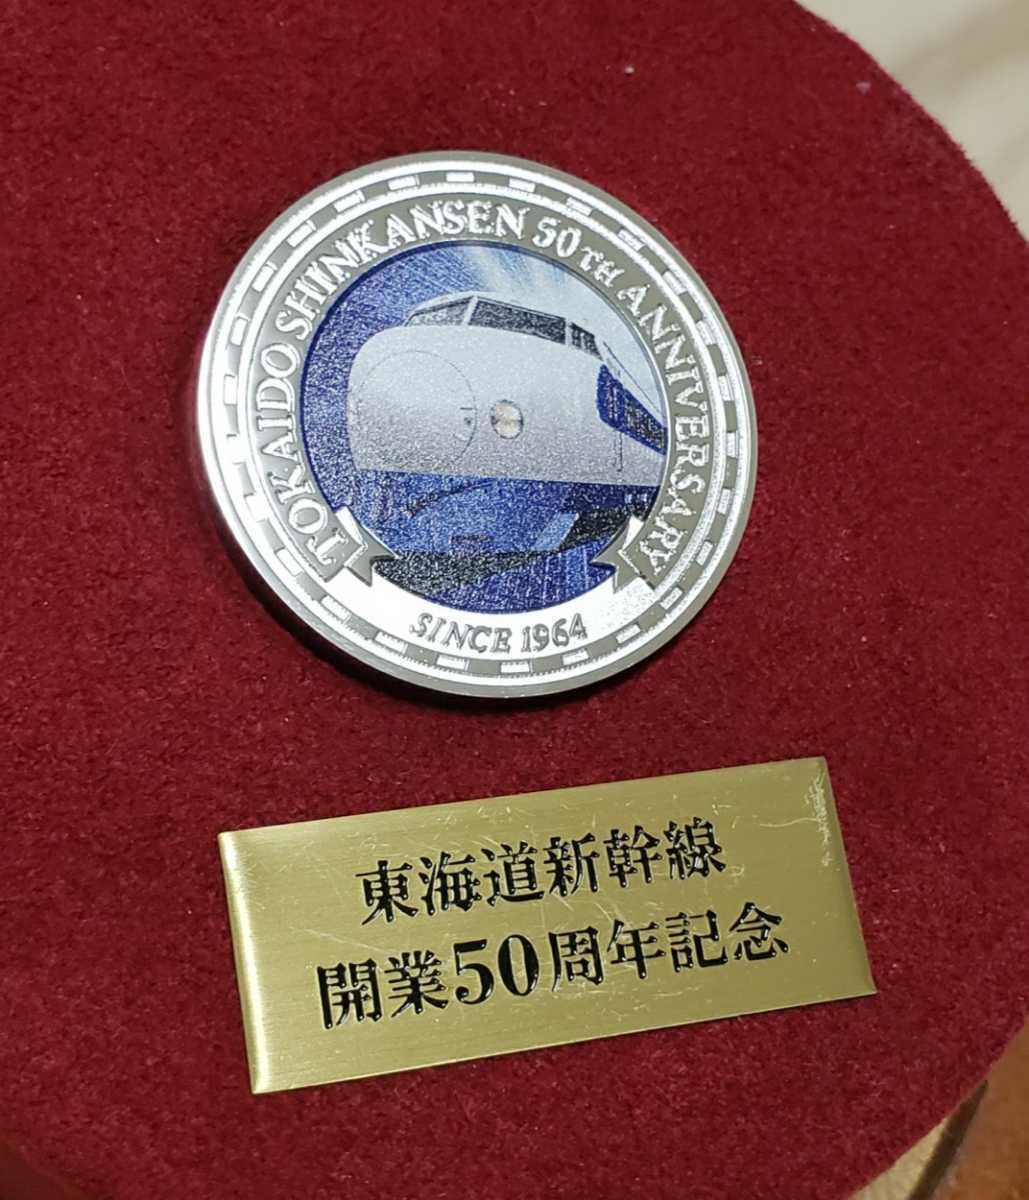 新幹線鉄道開業50周年記念 50枚限定生産 純銀メダル_画像5